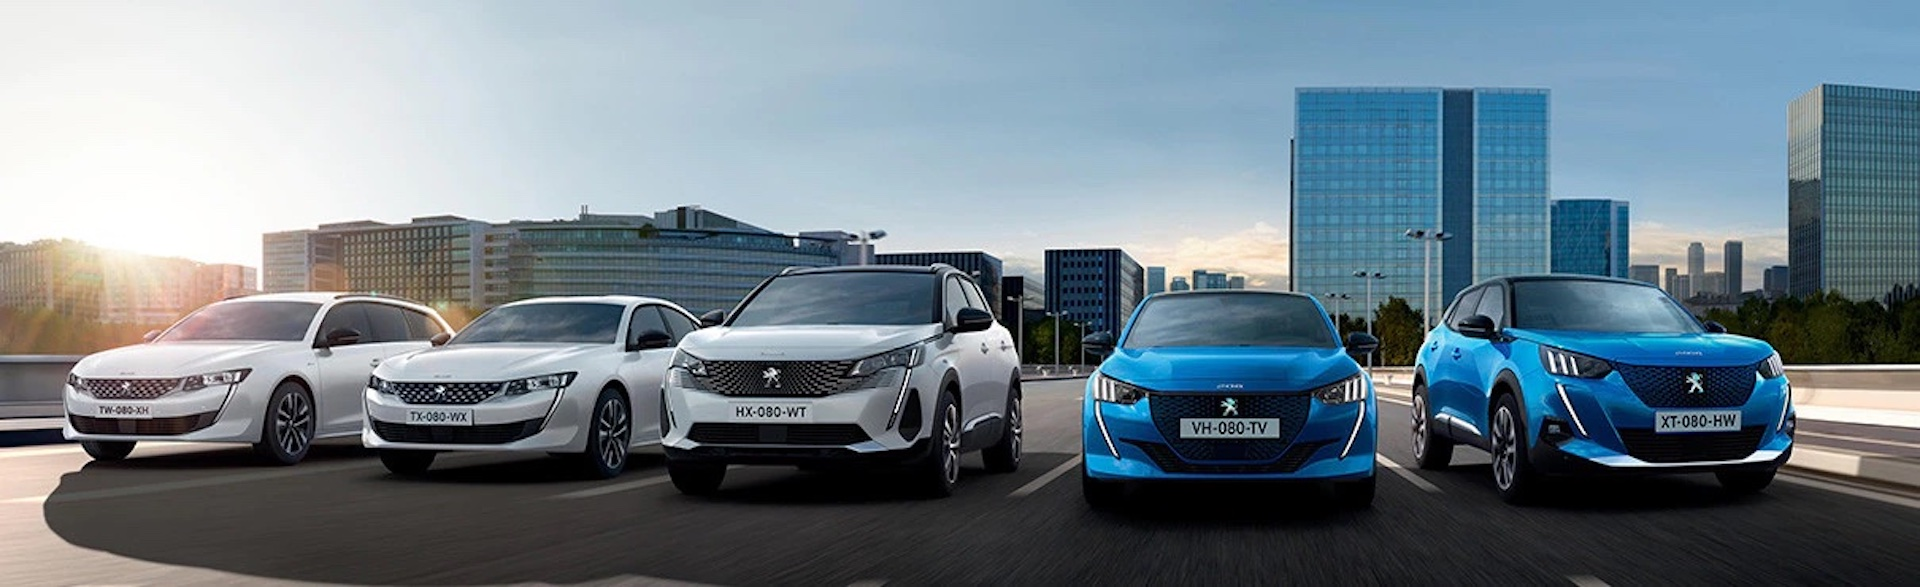 modelos novos da Peugeot